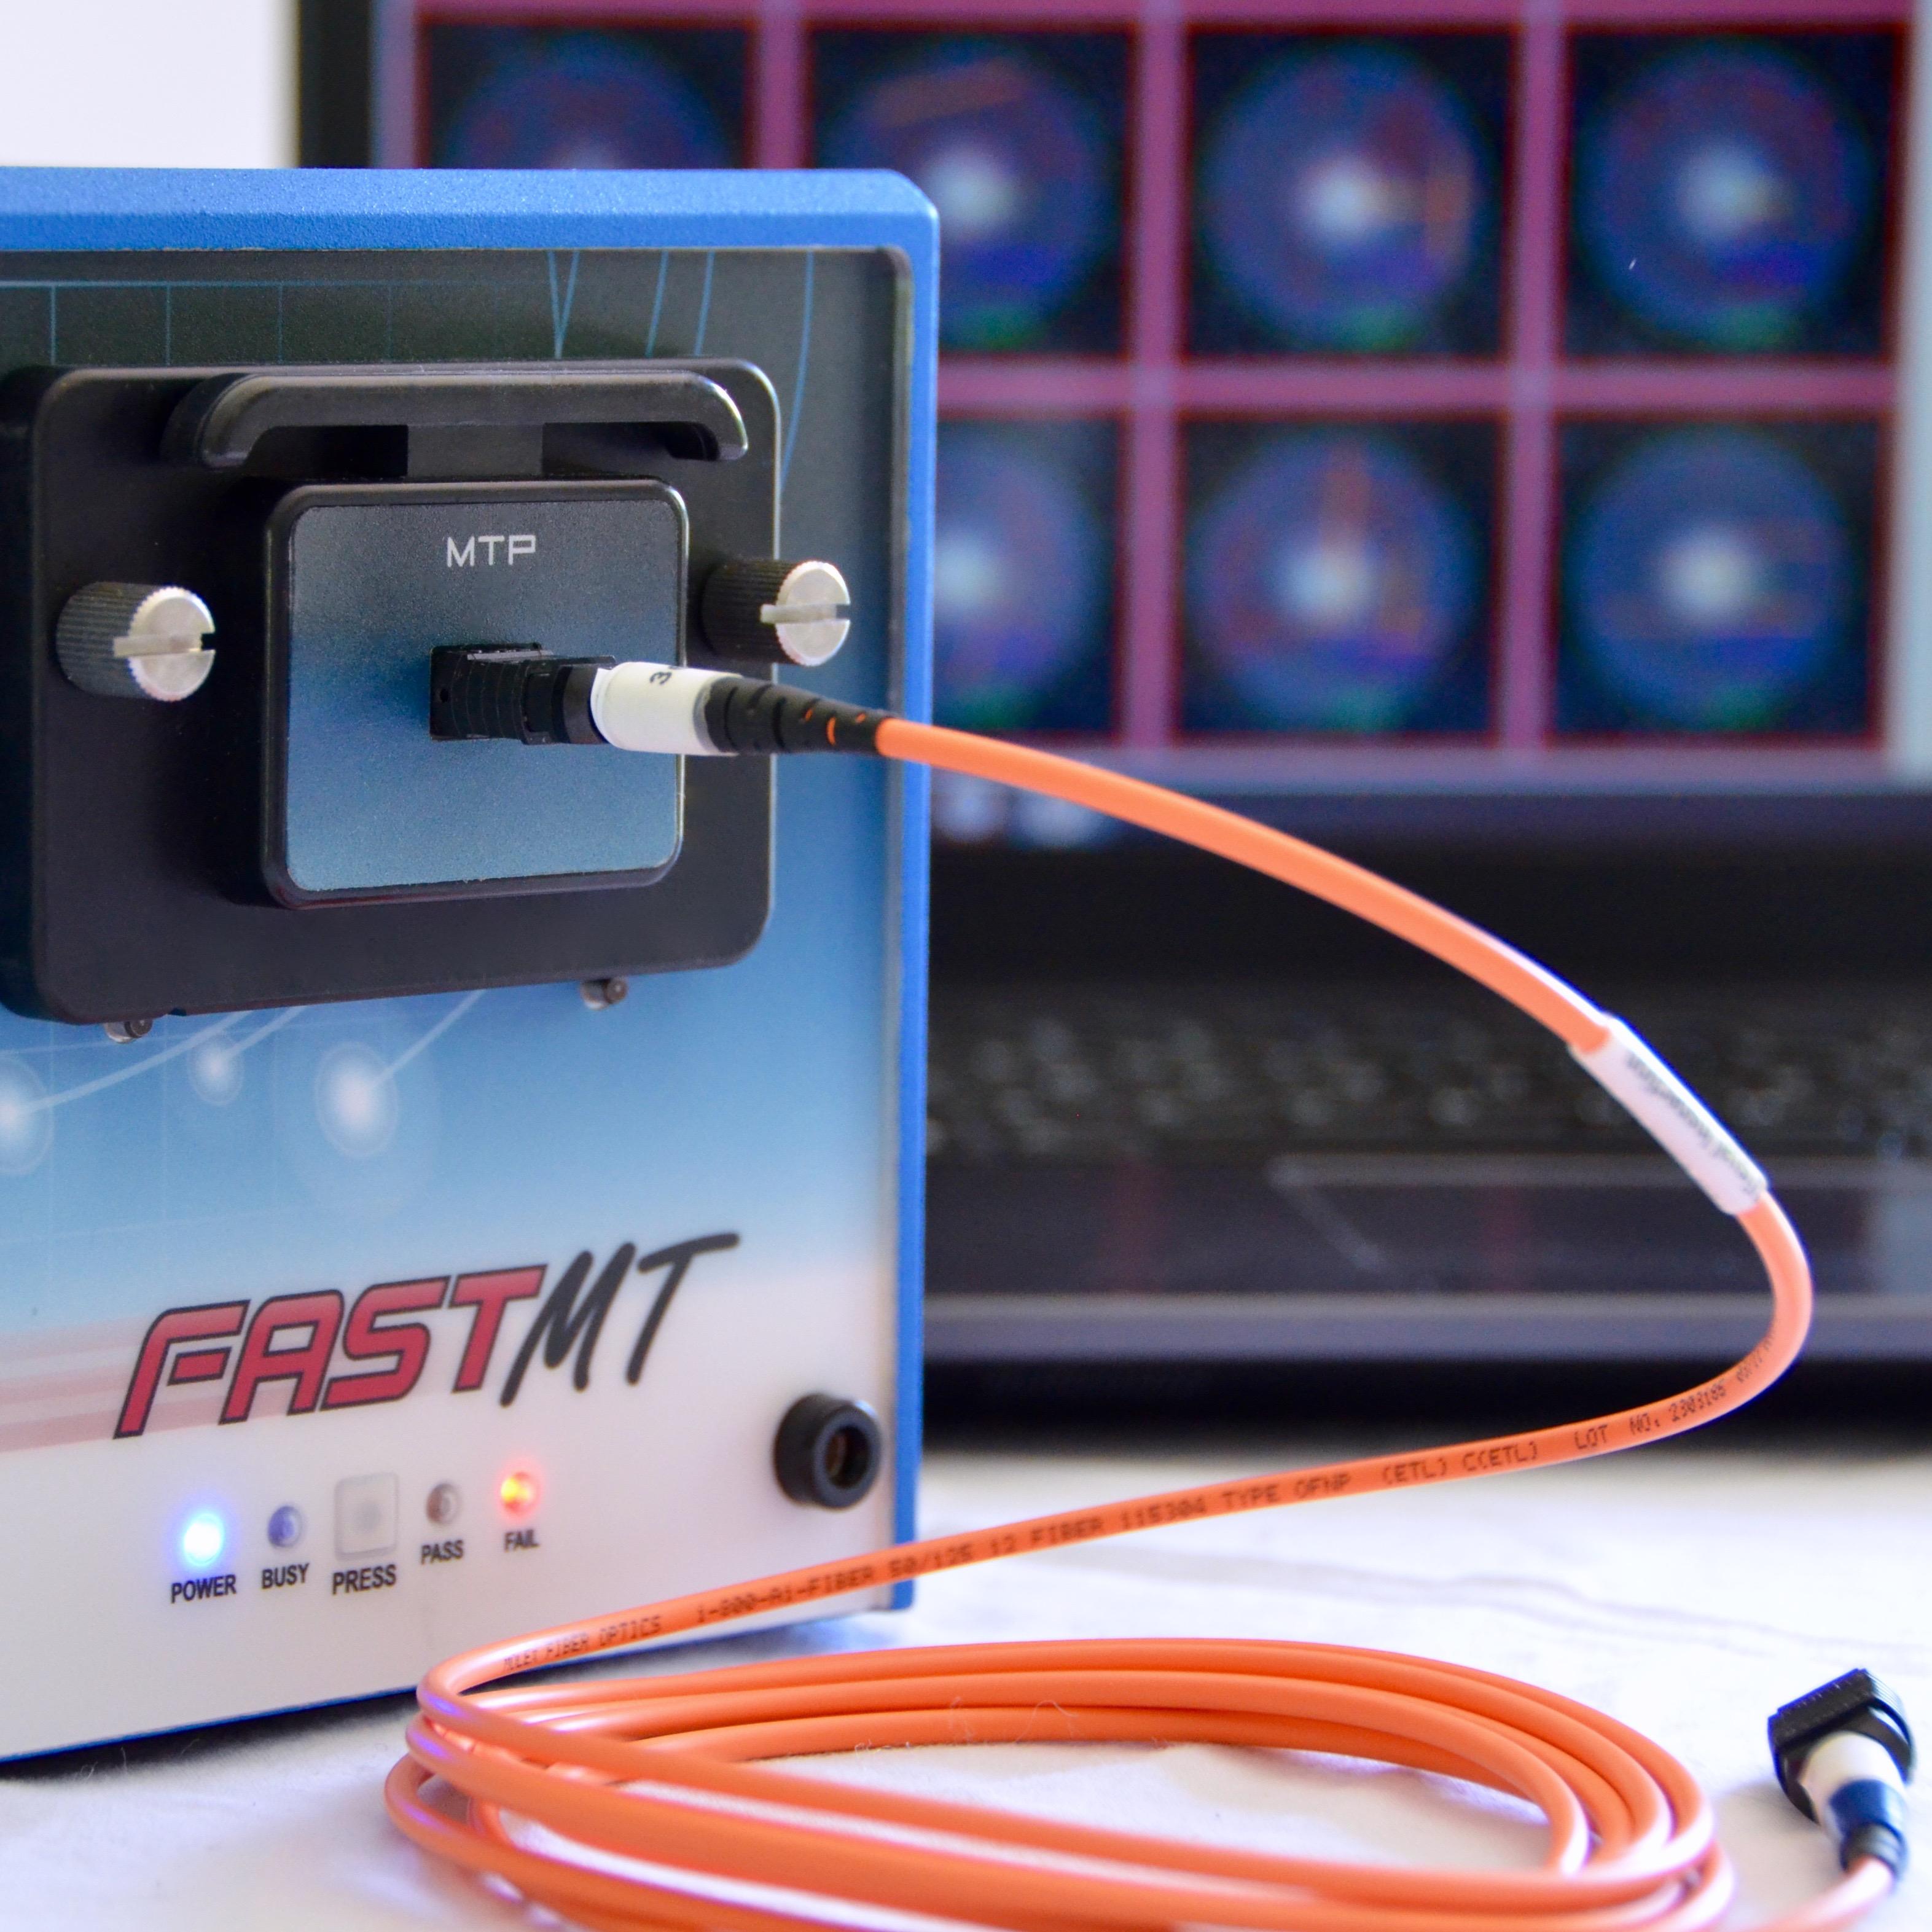 FastMT_MTP-fixture_laptop.jpg